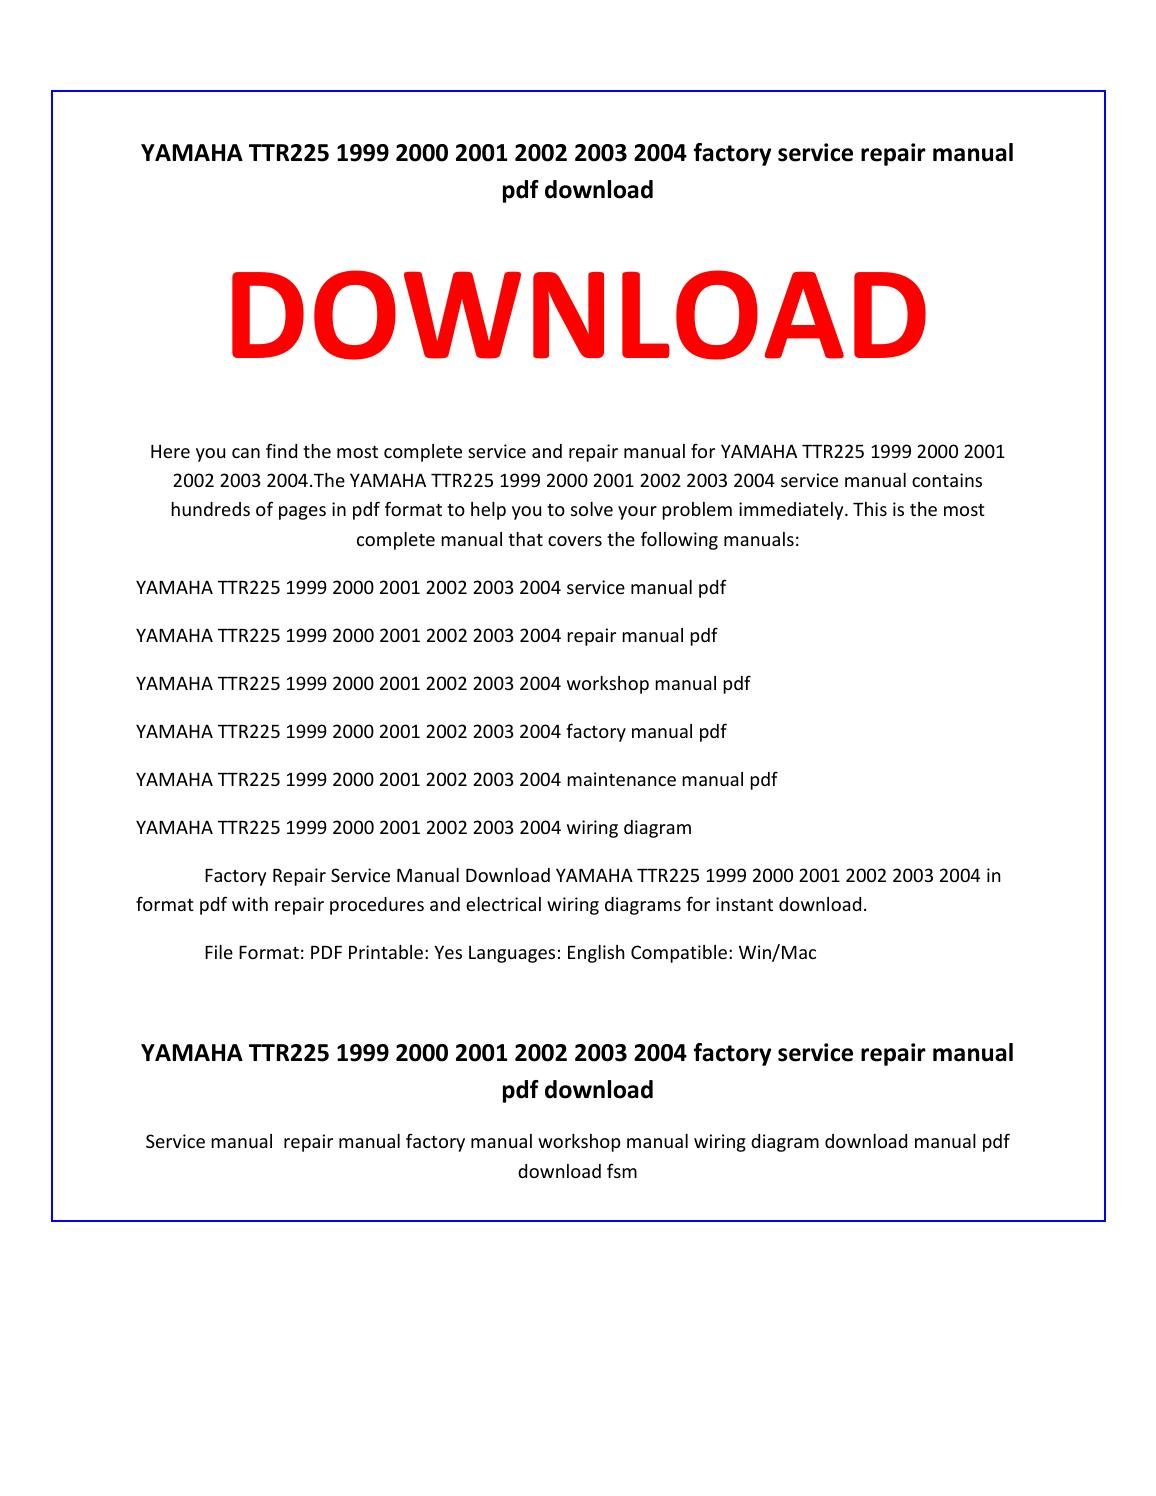 Yamaha ttr225 1999 2000 2001 2002 2003 2004 service repair manual by service  manual - issuu